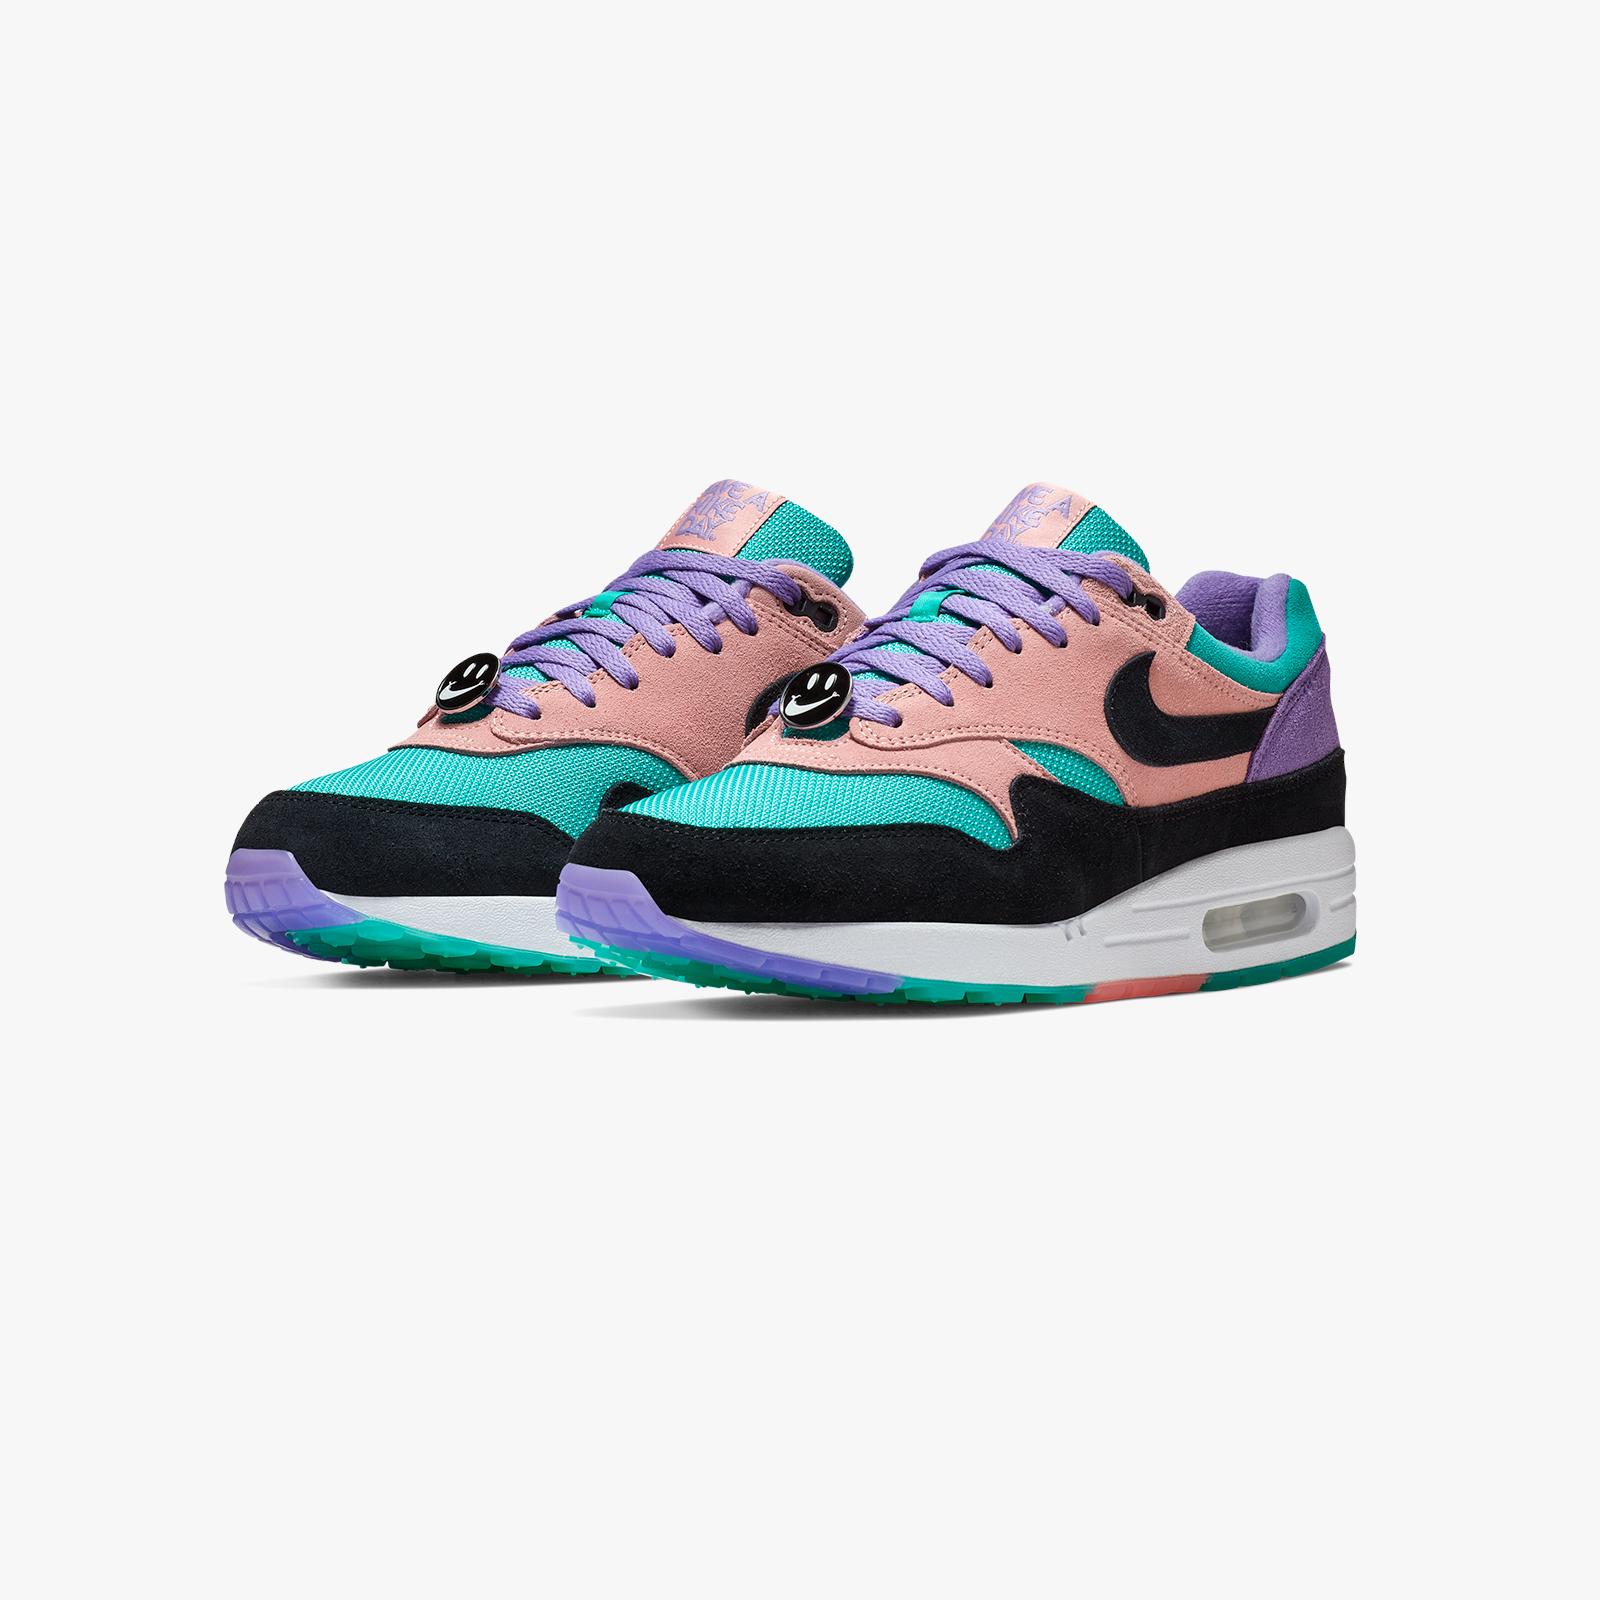 Nike Air Max 1 ND Bq8929 500 Sneakersnstuff I Sneakers